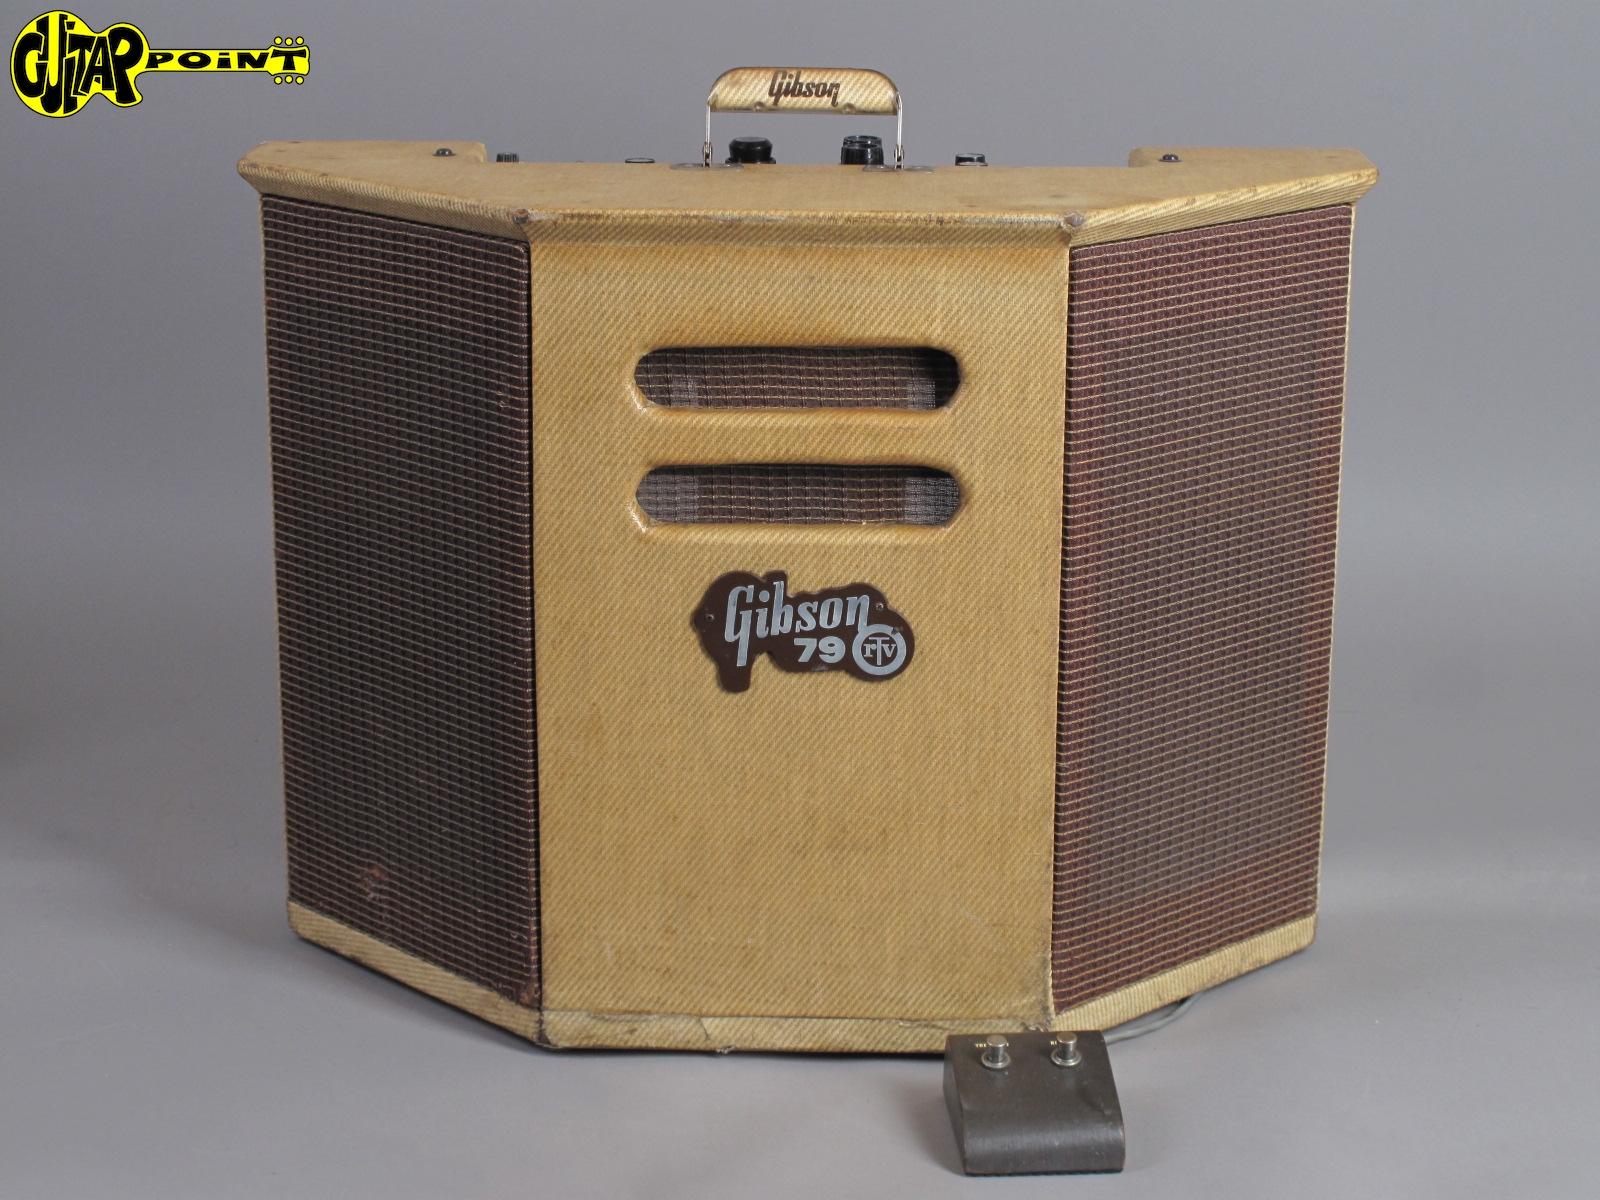 1961 Gibson GA-79 RVT - Multi Stereo Amplifier